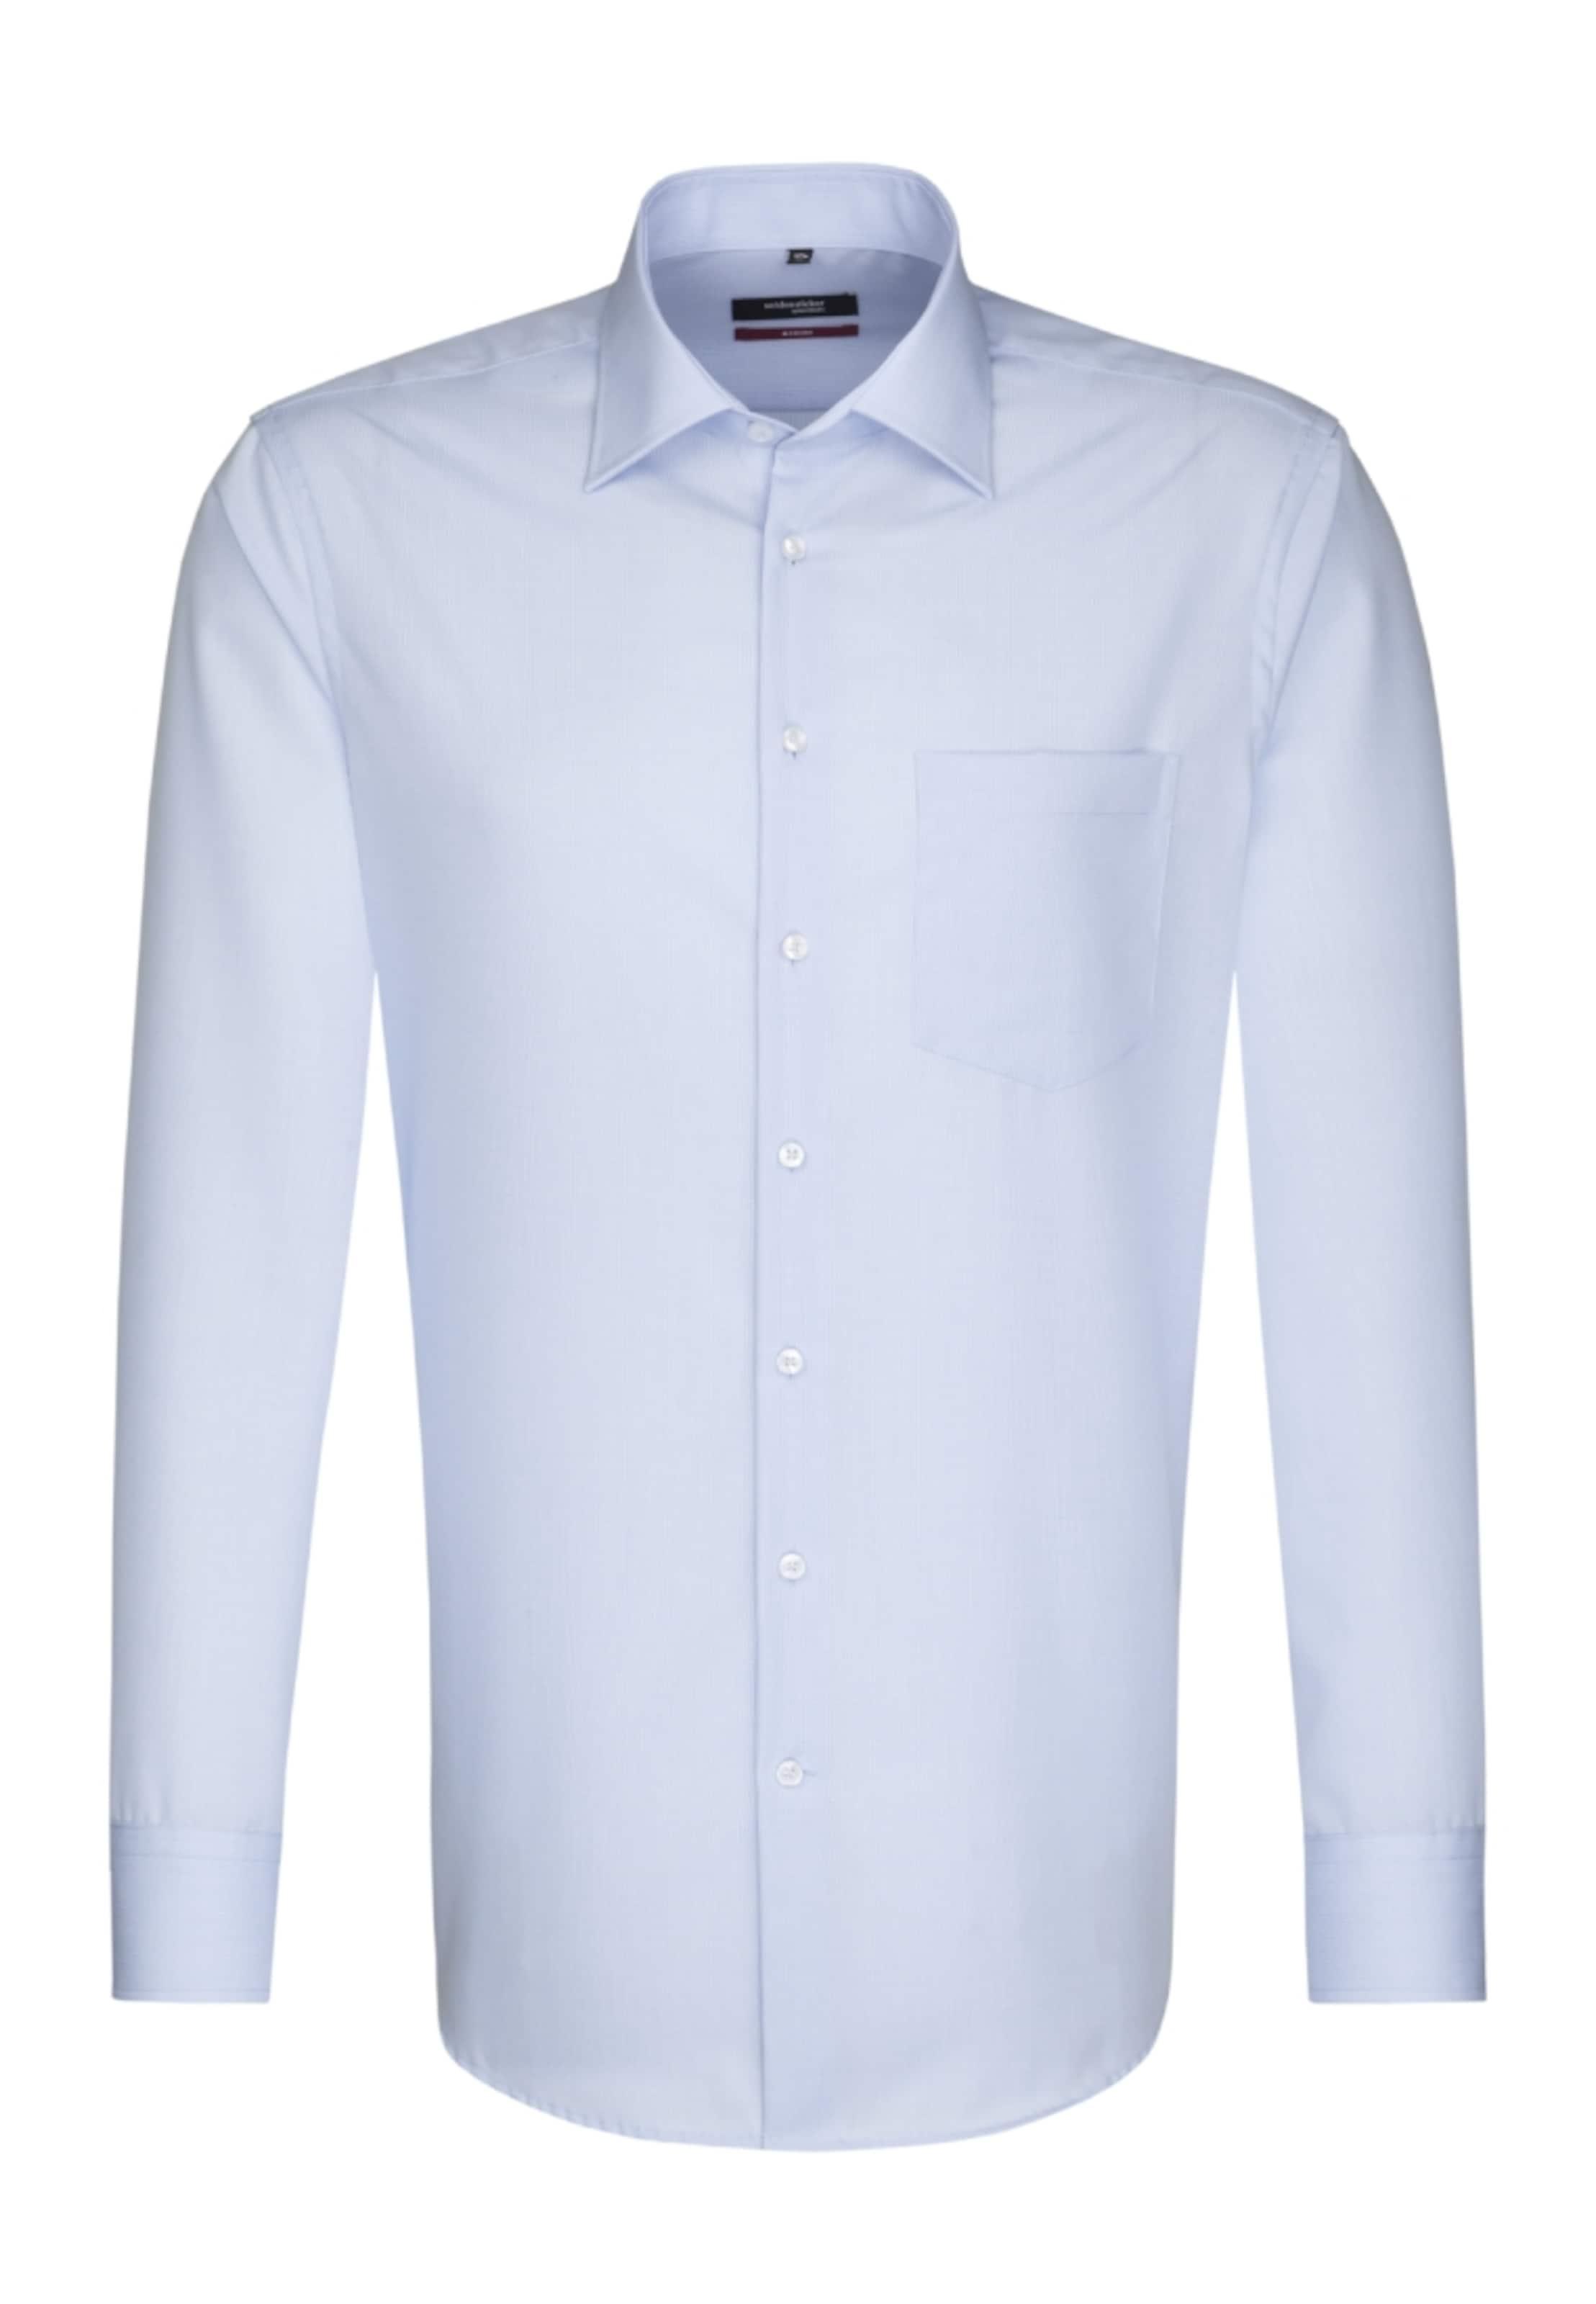 Seidensticker City In hemd Hellblau 'modern' xoWdBreC